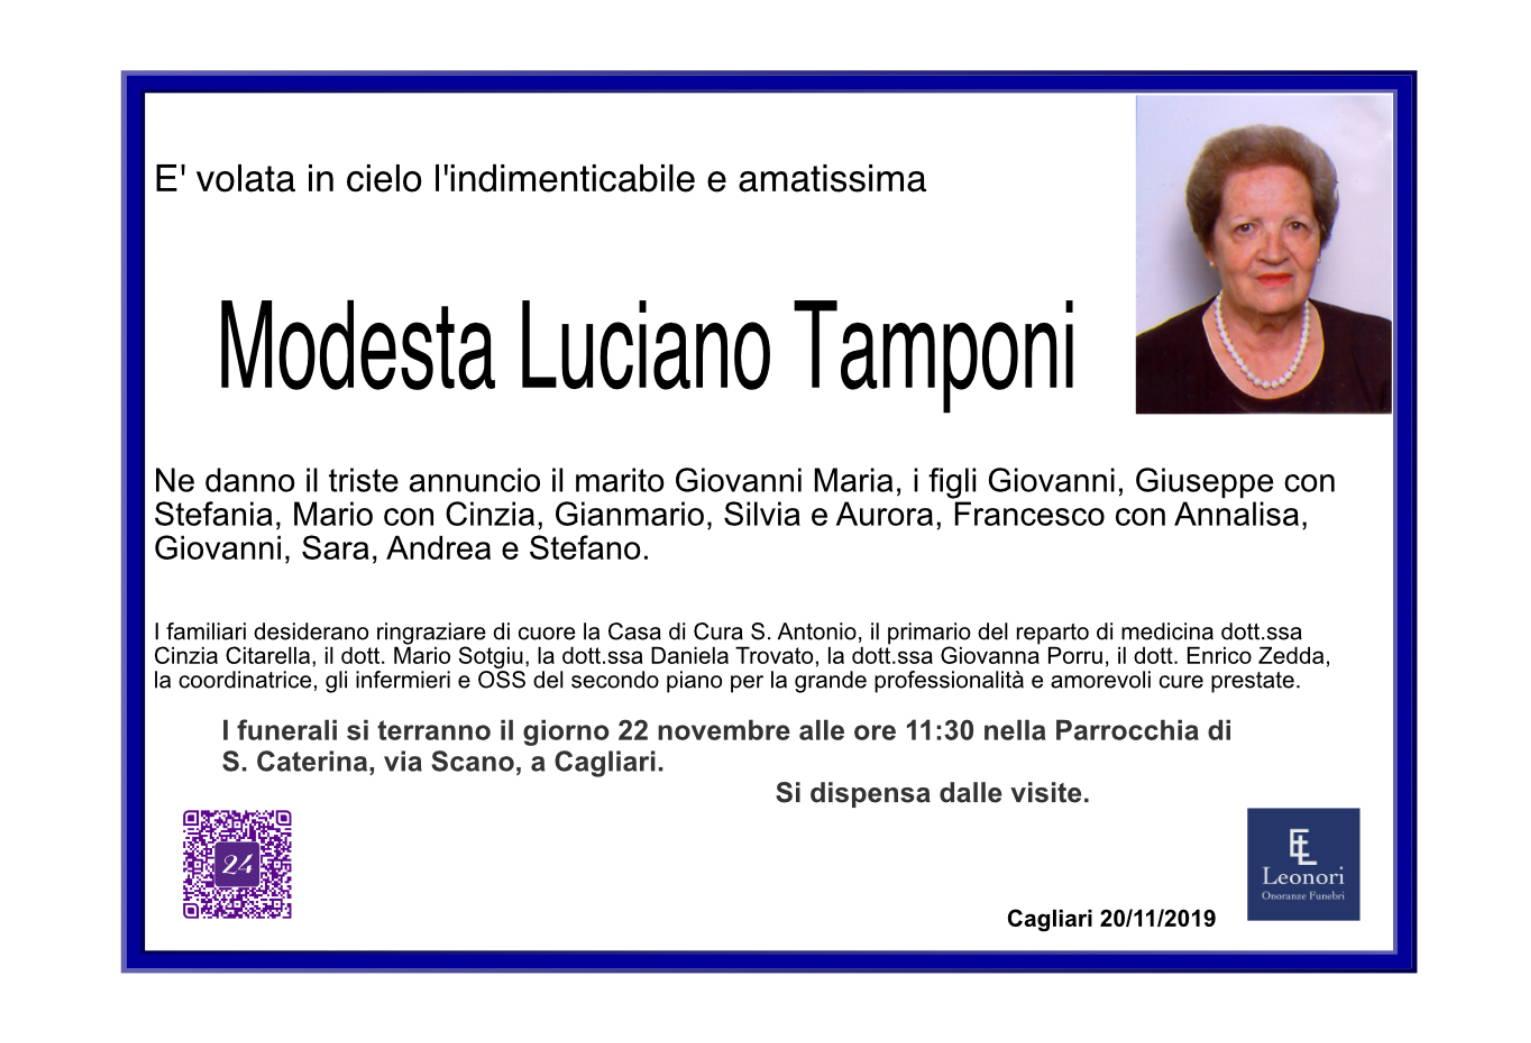 Modesta Luciano